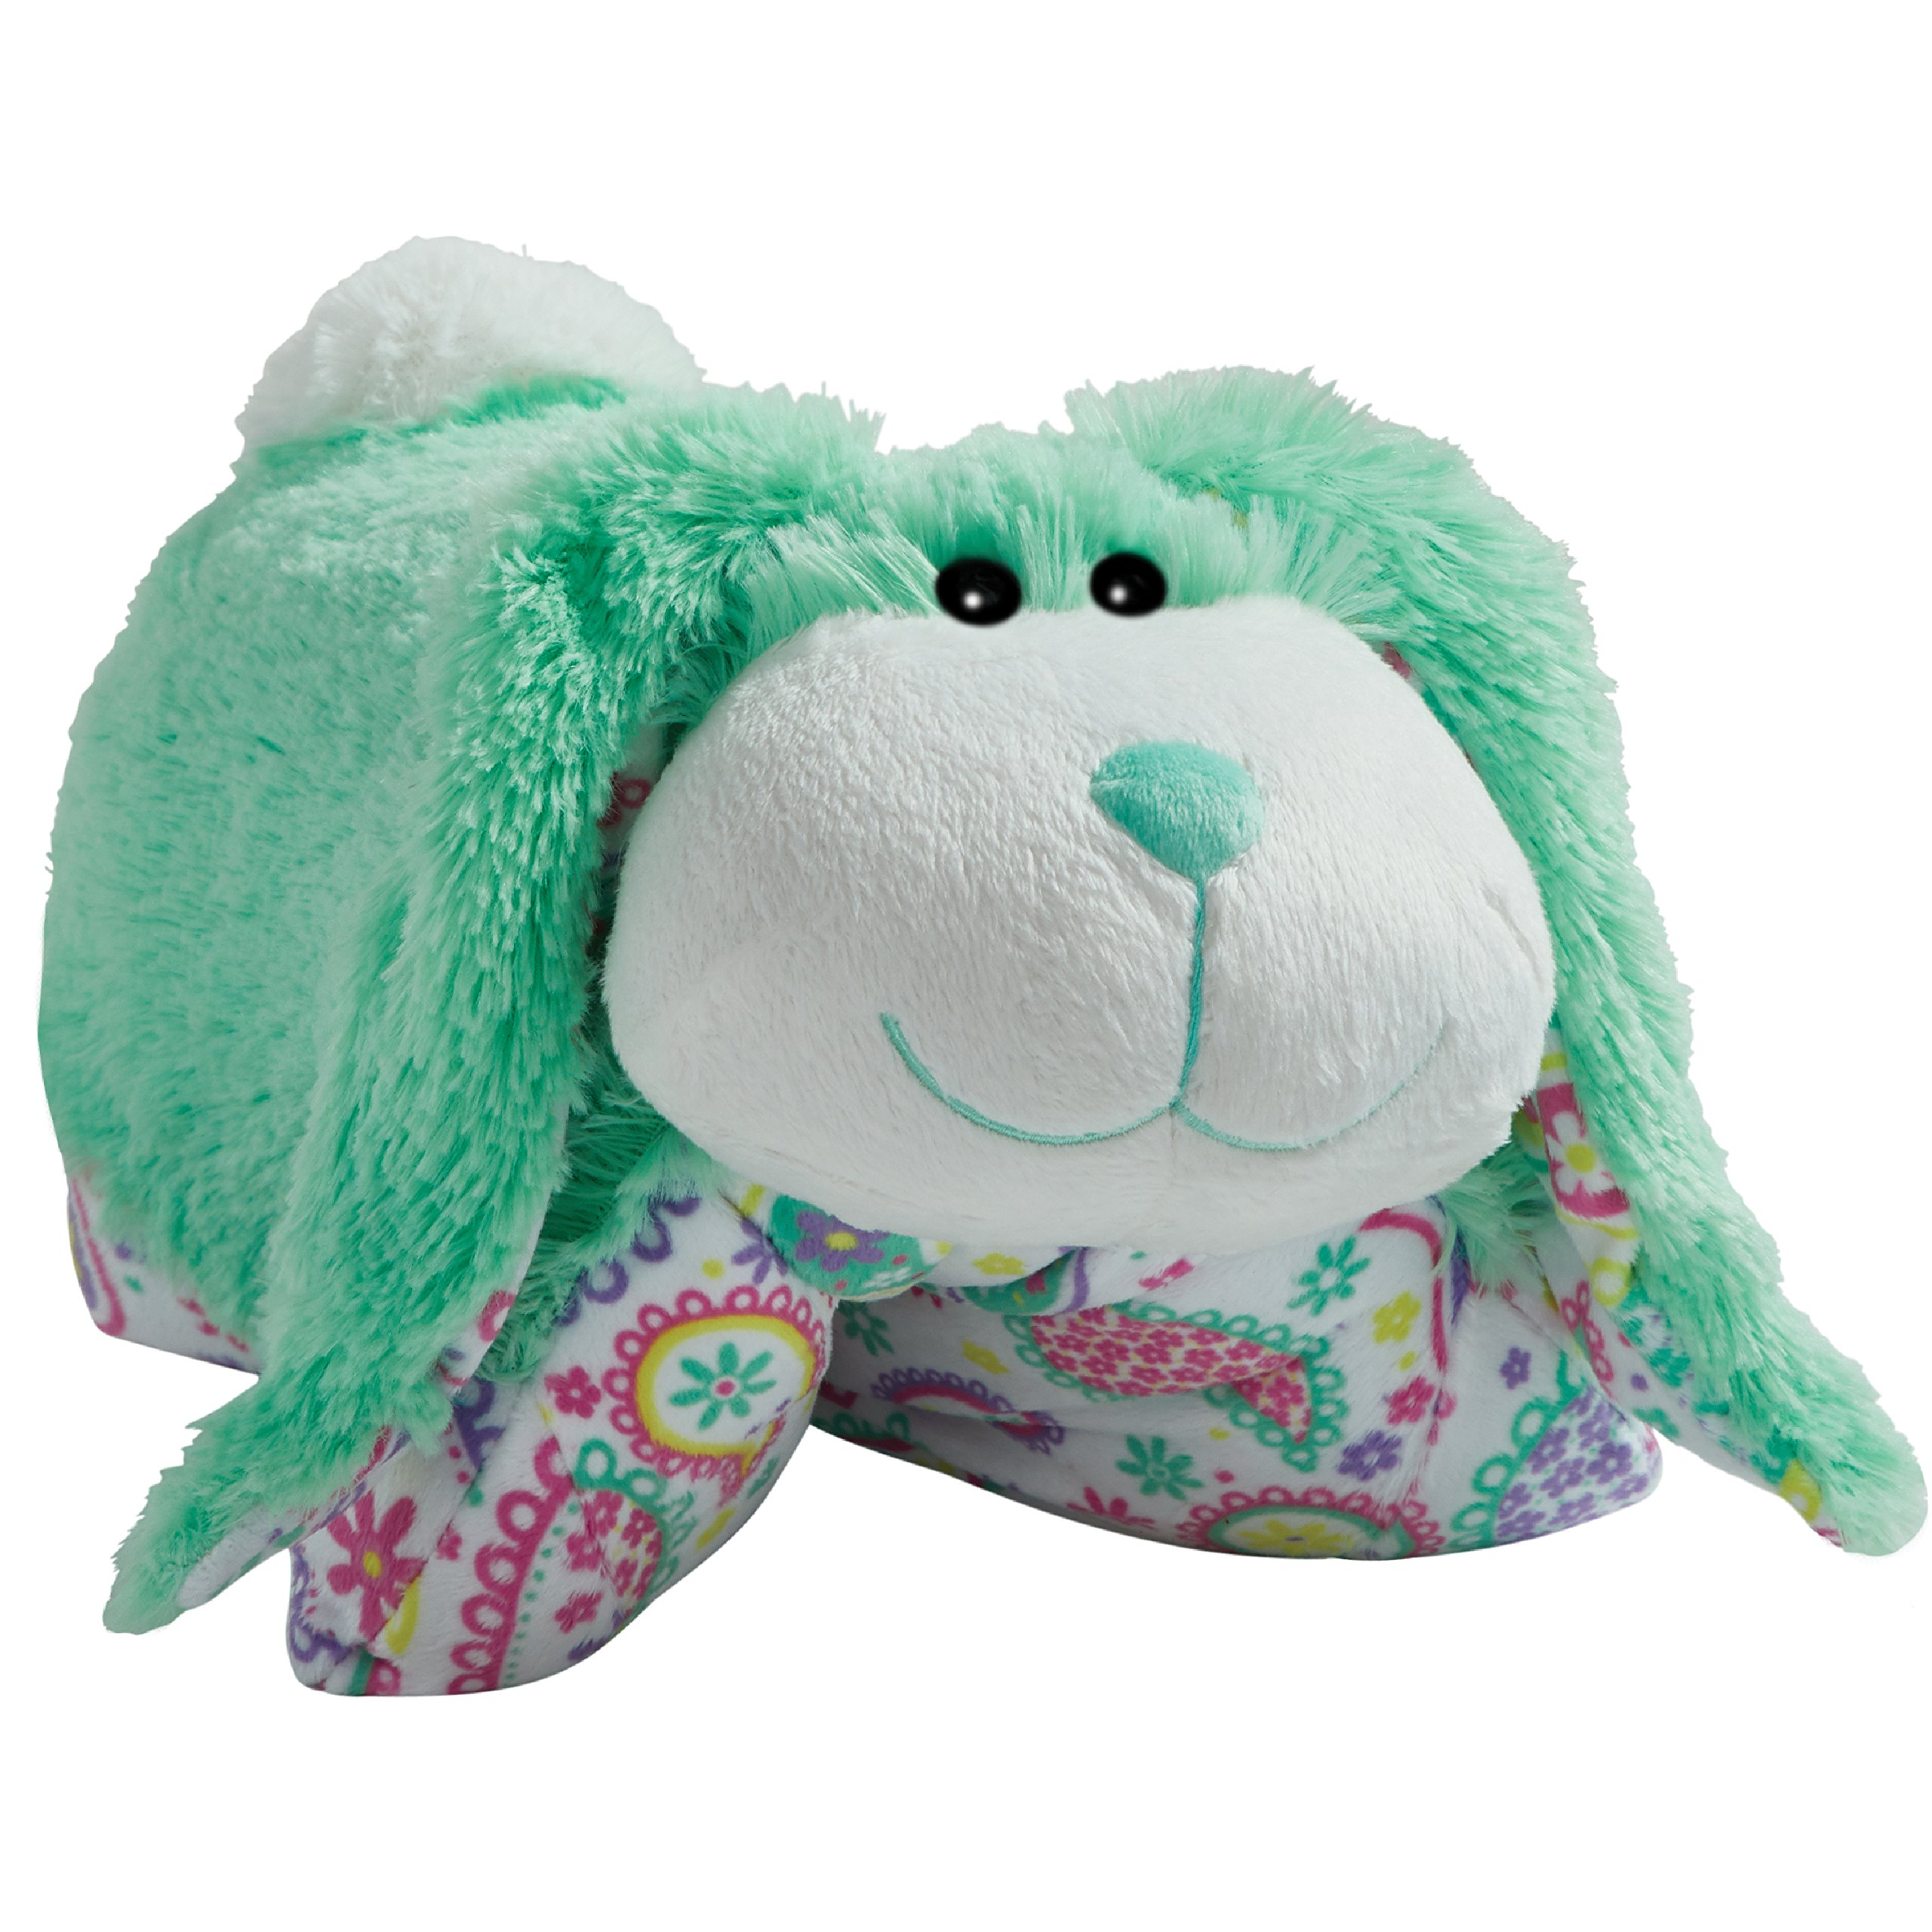 Pillow Pets Springtime, Mint Bunny, 18'' Stuffed Animal Plush Toy by Pillow Pets